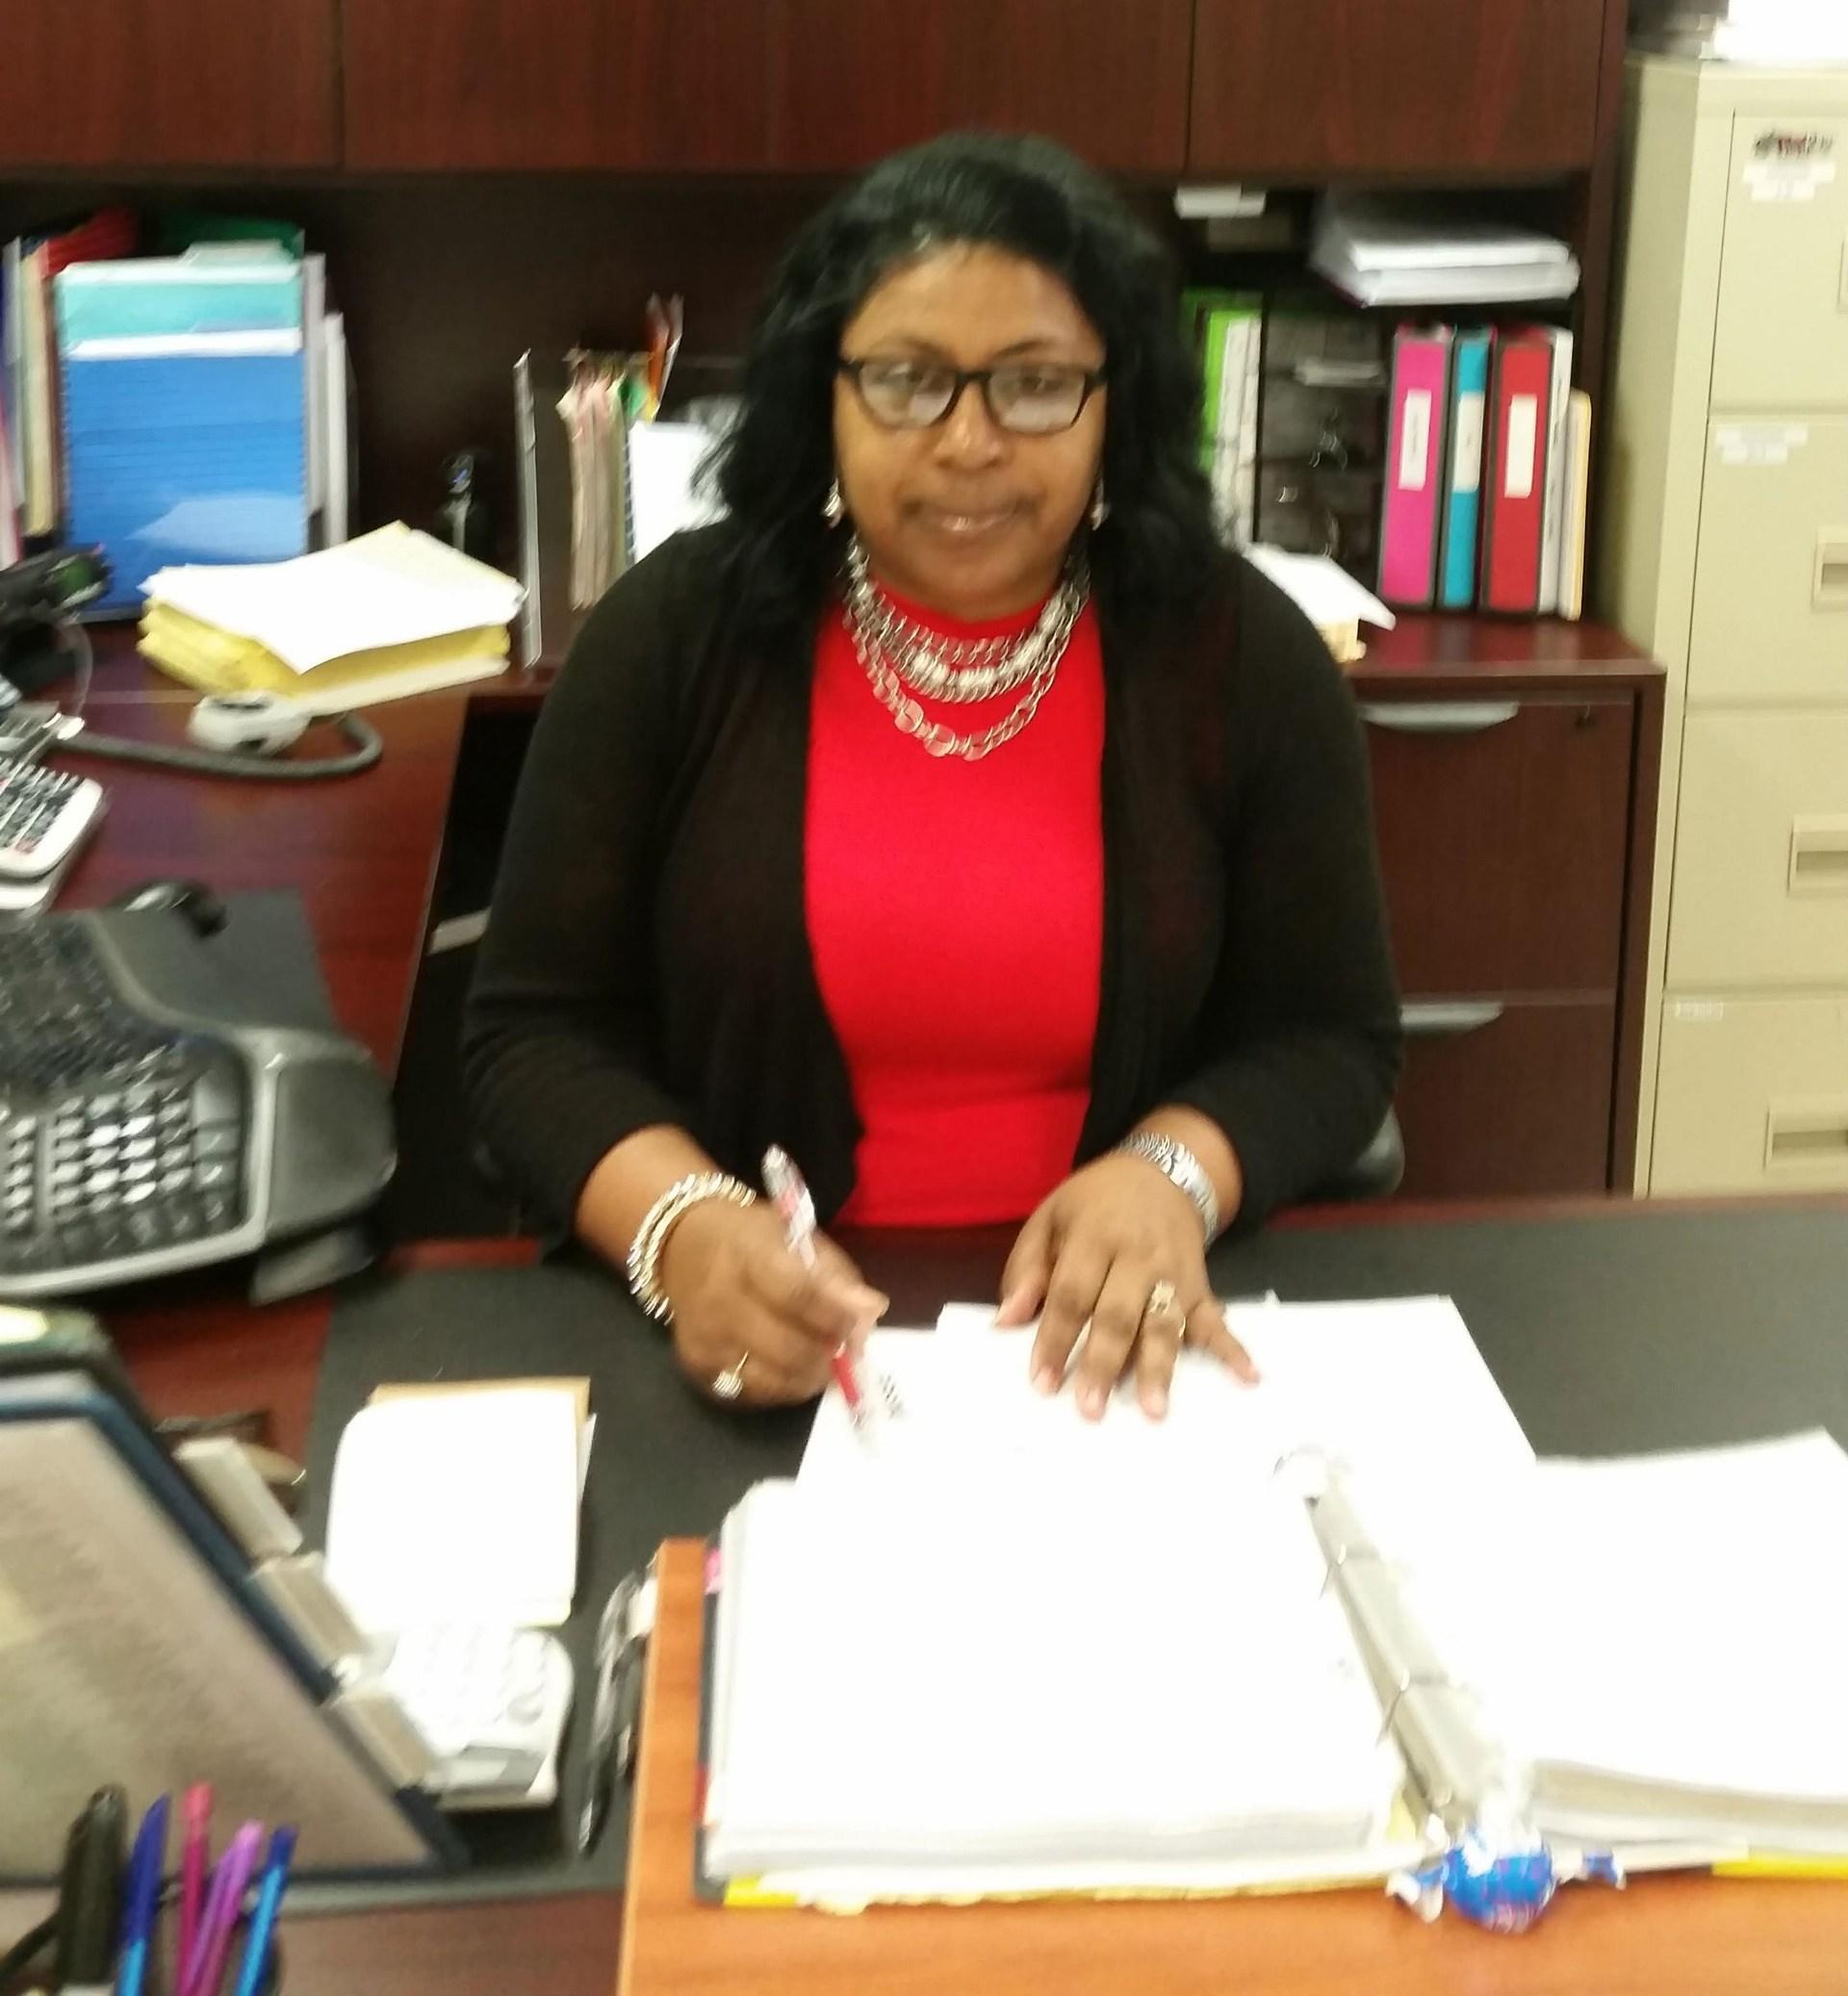 Kathy Kitchen,Transportation Coordinator